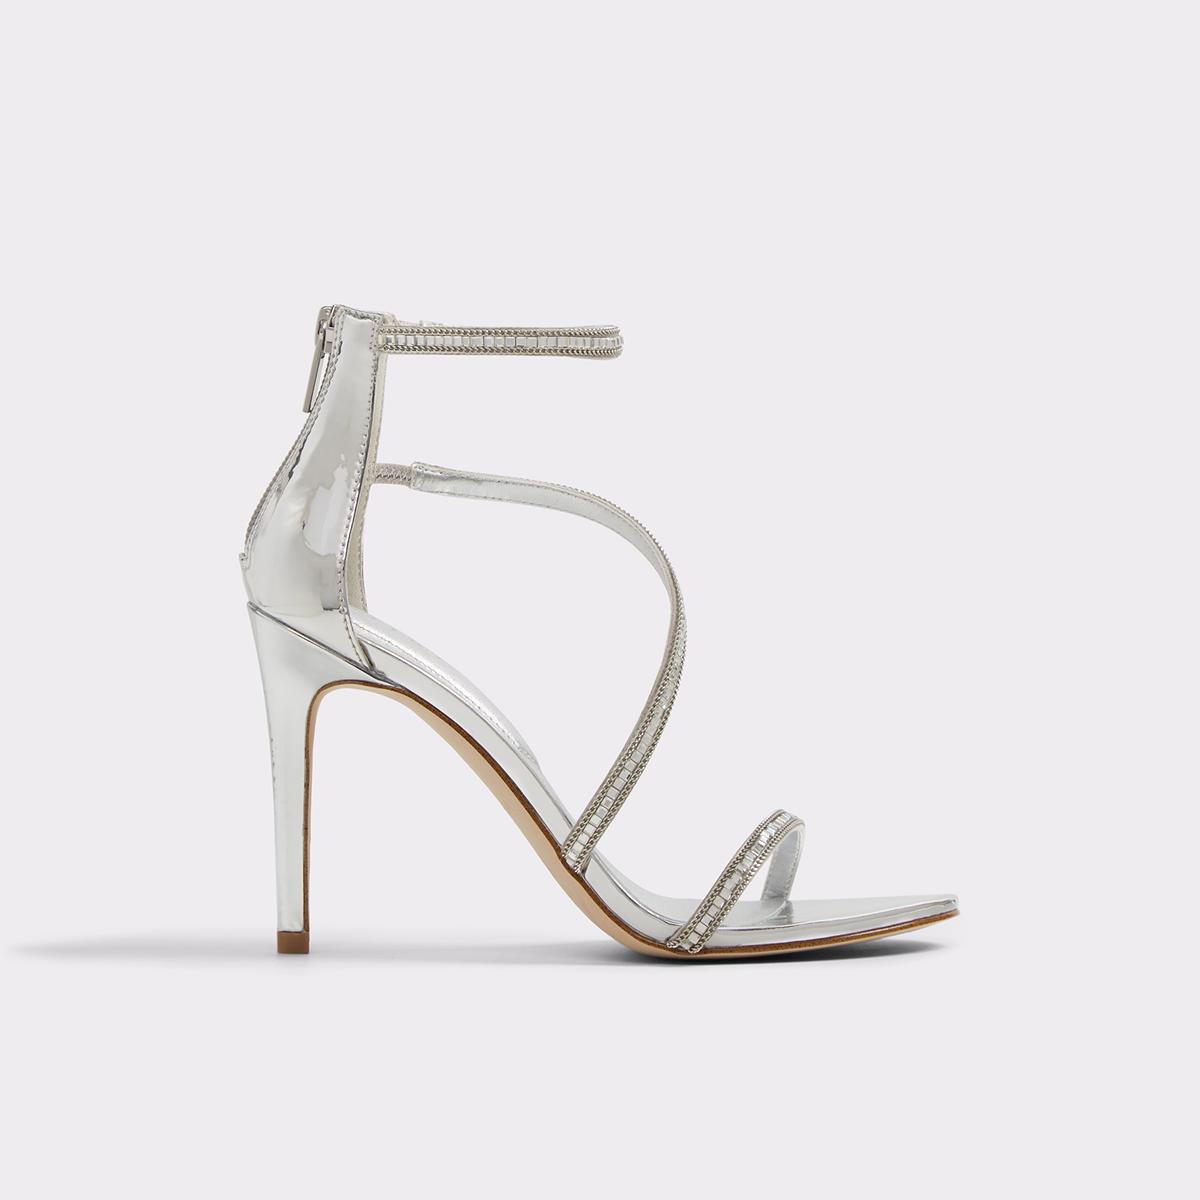 ALDO Umude Bling Jeweled Strappy Dress Sandals XMCYJ